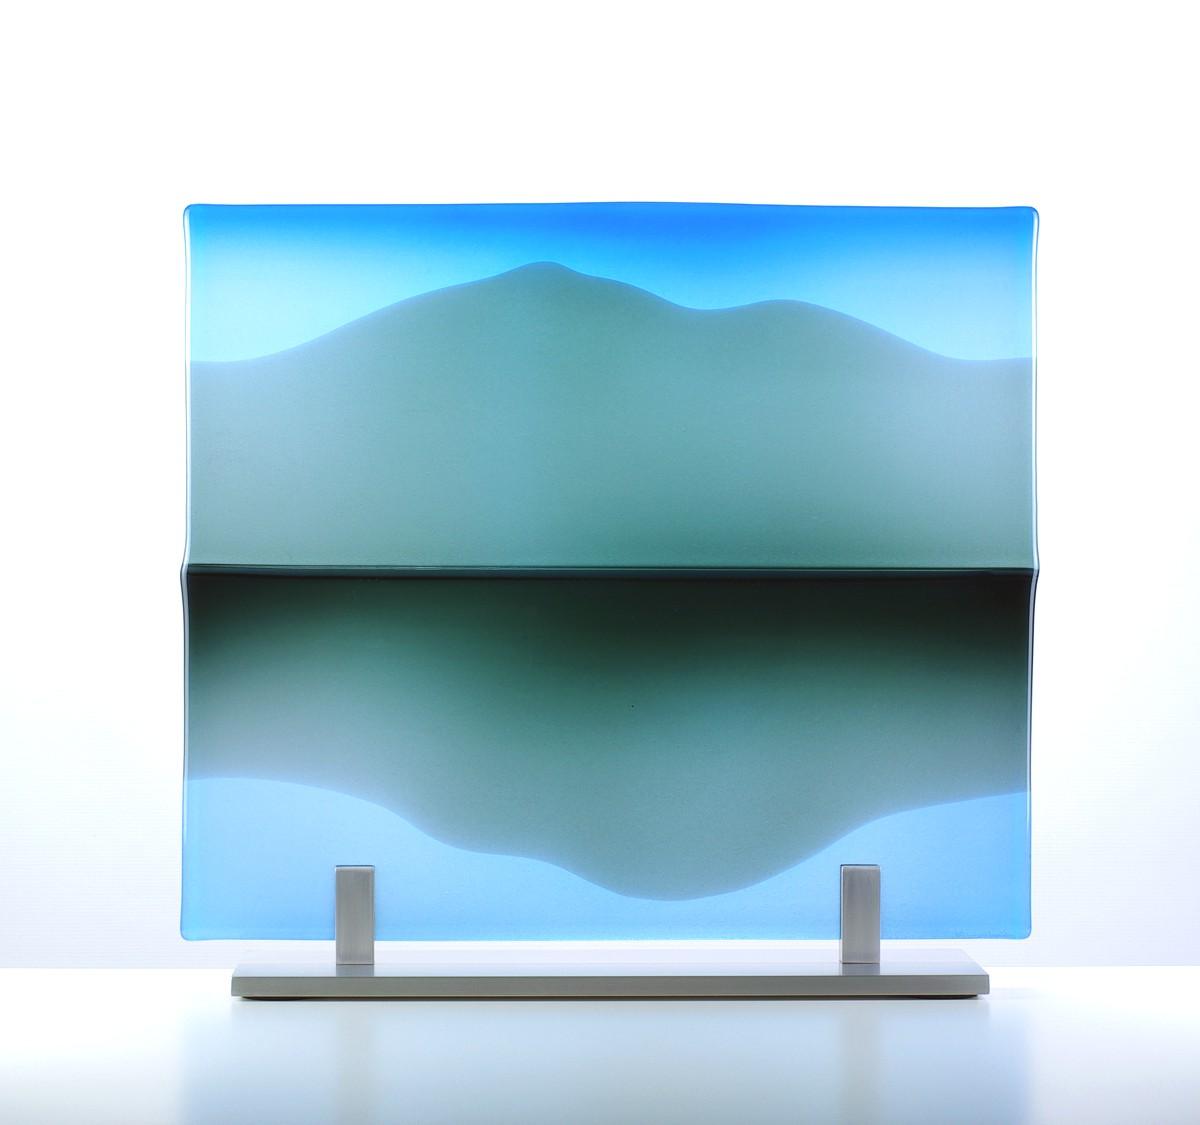 1809 - LMG - Glass panel - Still